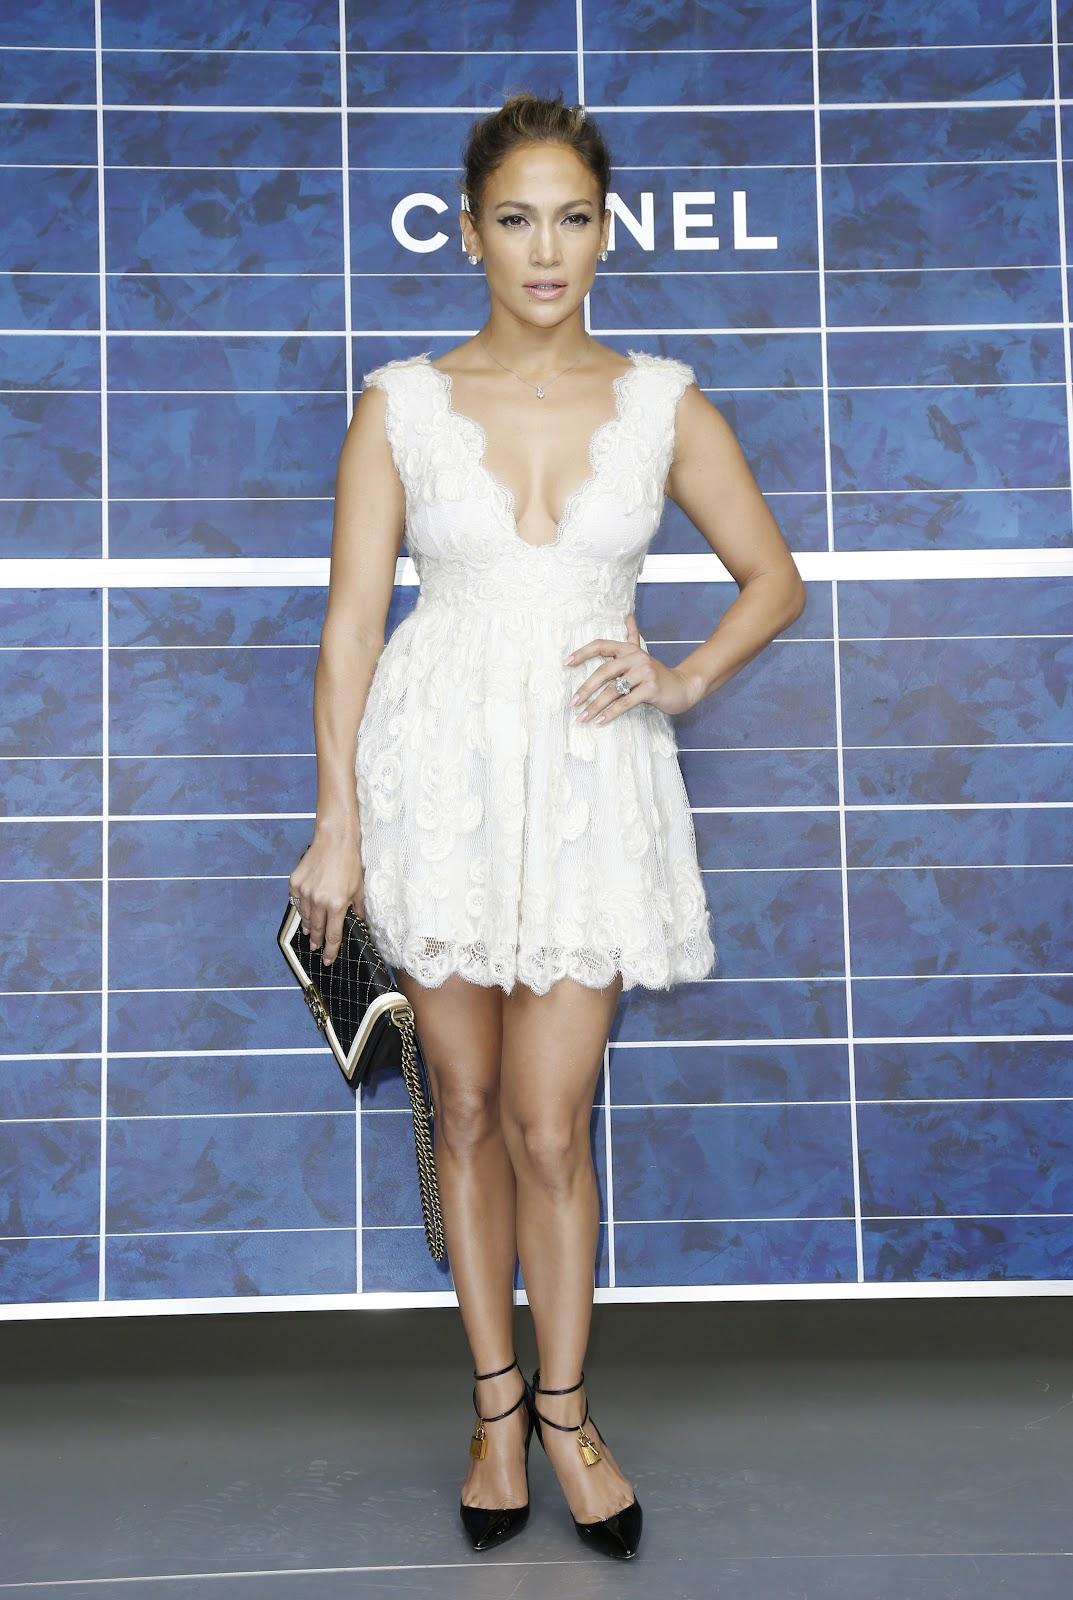 http://3.bp.blogspot.com/-QOCY9Qjdf9M/UGrwZ8SpYHI/AAAAAAAAP7I/etgENVzPw_4/s1600/Jennifer+Lopez++October+2012+%27Chanel%27+Fashion+Show.jpg